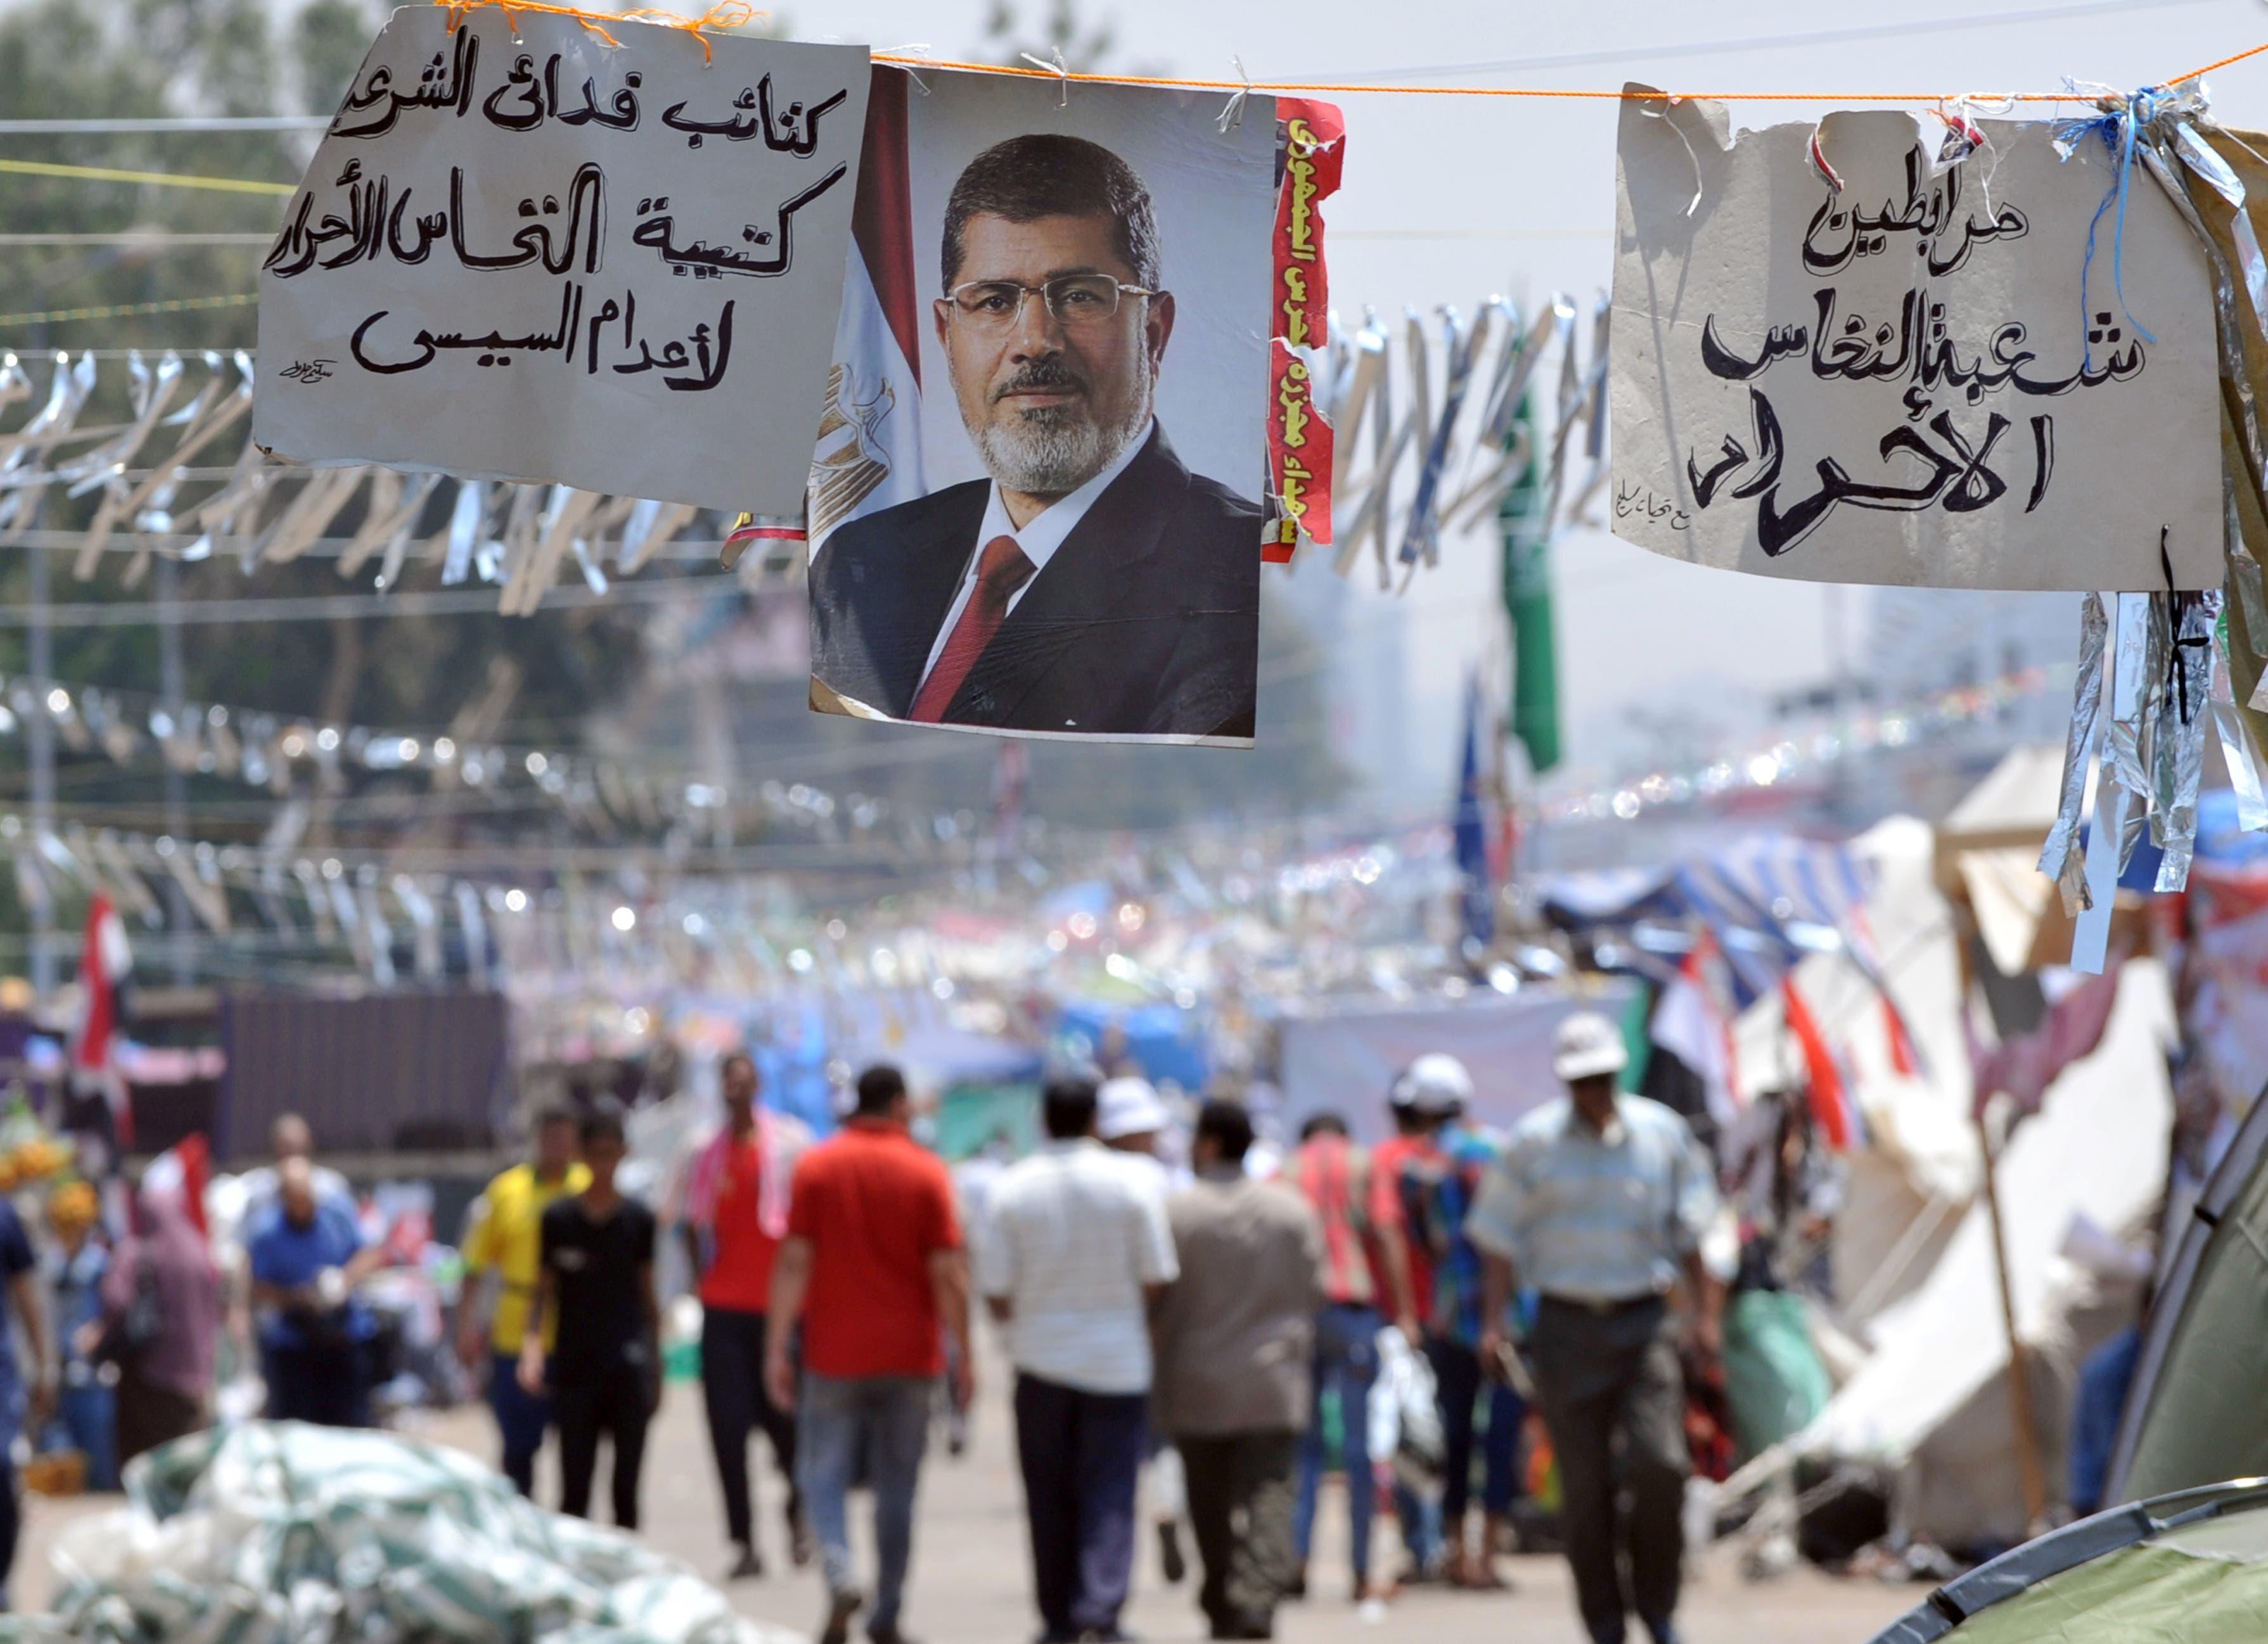 Supporters of Egypt's deposed president Mohamed Morsi walk past his portrait in Cairo (AFP/FAYEZ NURELDINE)